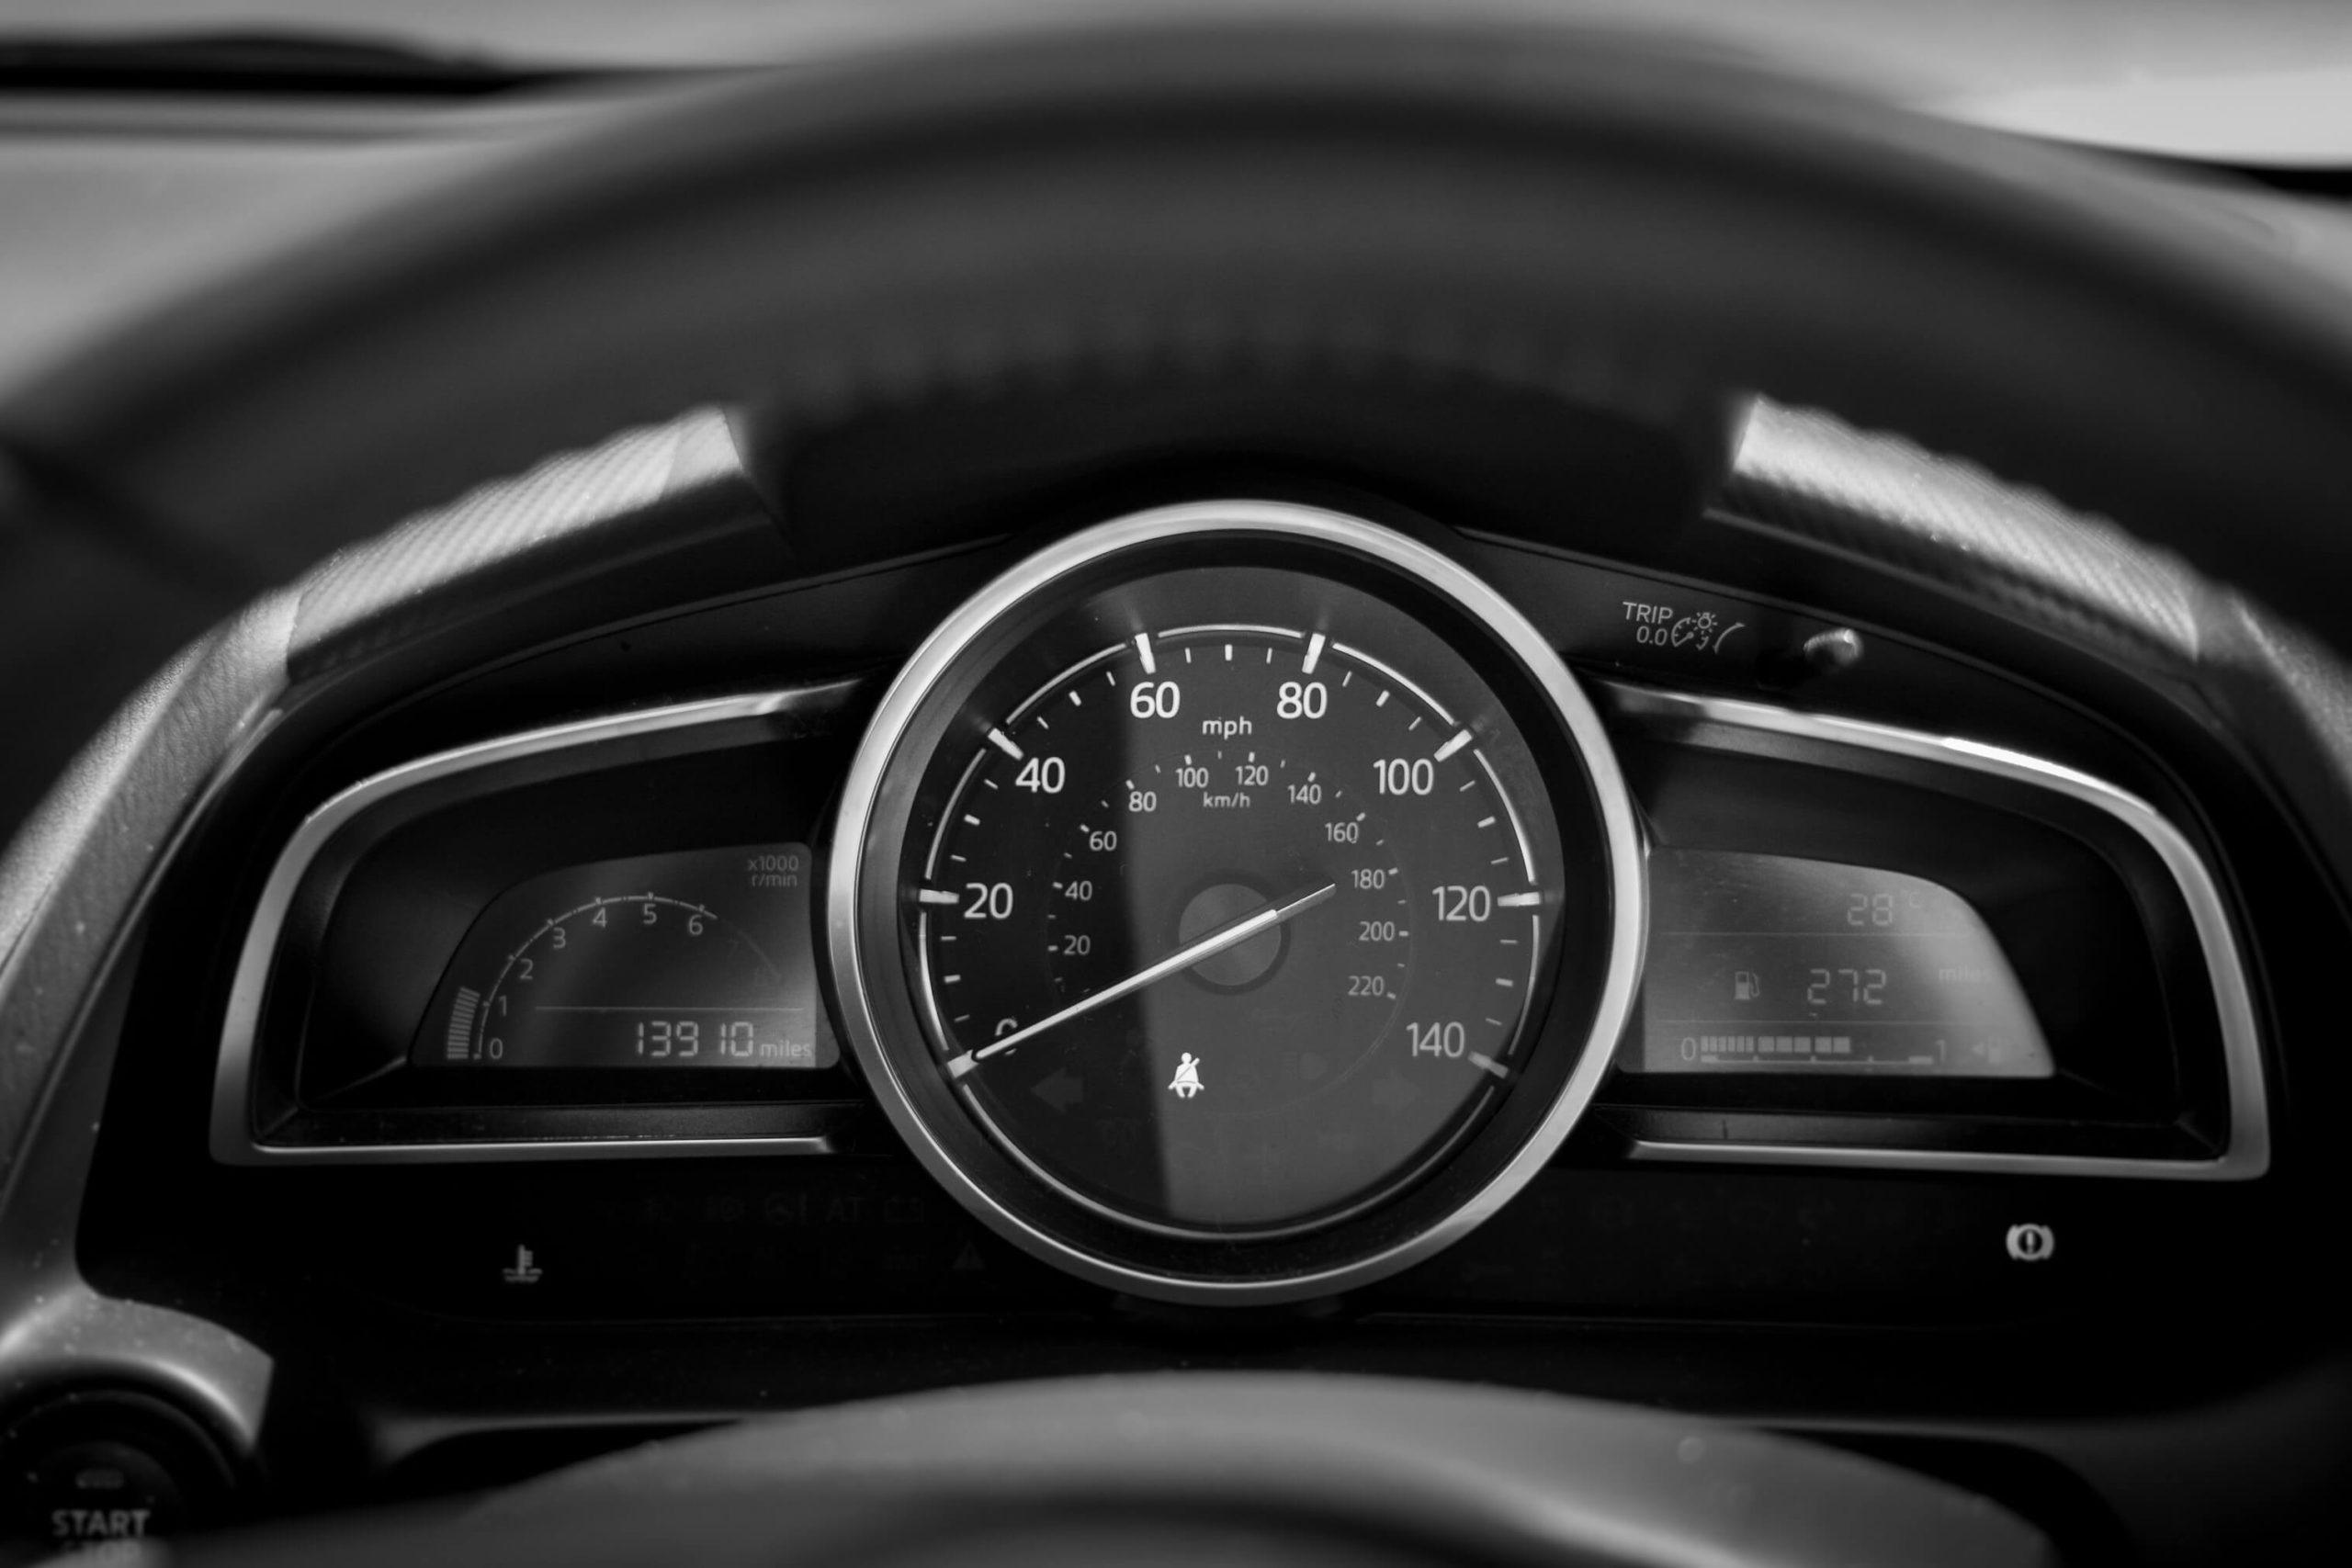 New Speeding Alert Feature